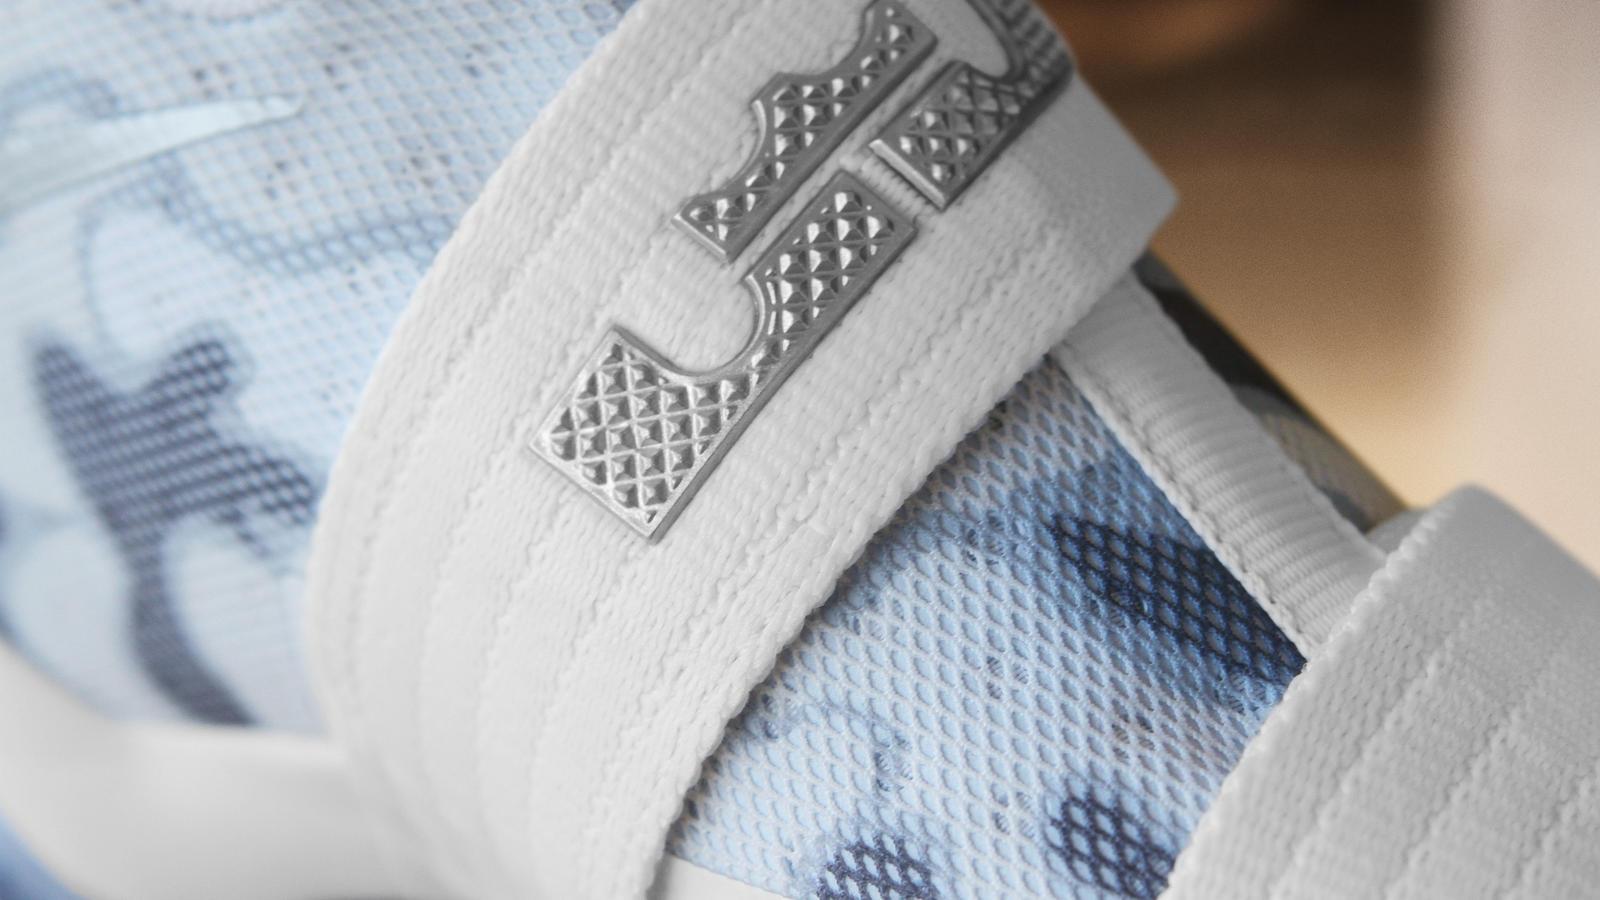 separation shoes f2069 0d63d Nike Zoom LeBron Soldier 10 White Camo NIKEiD Option 3